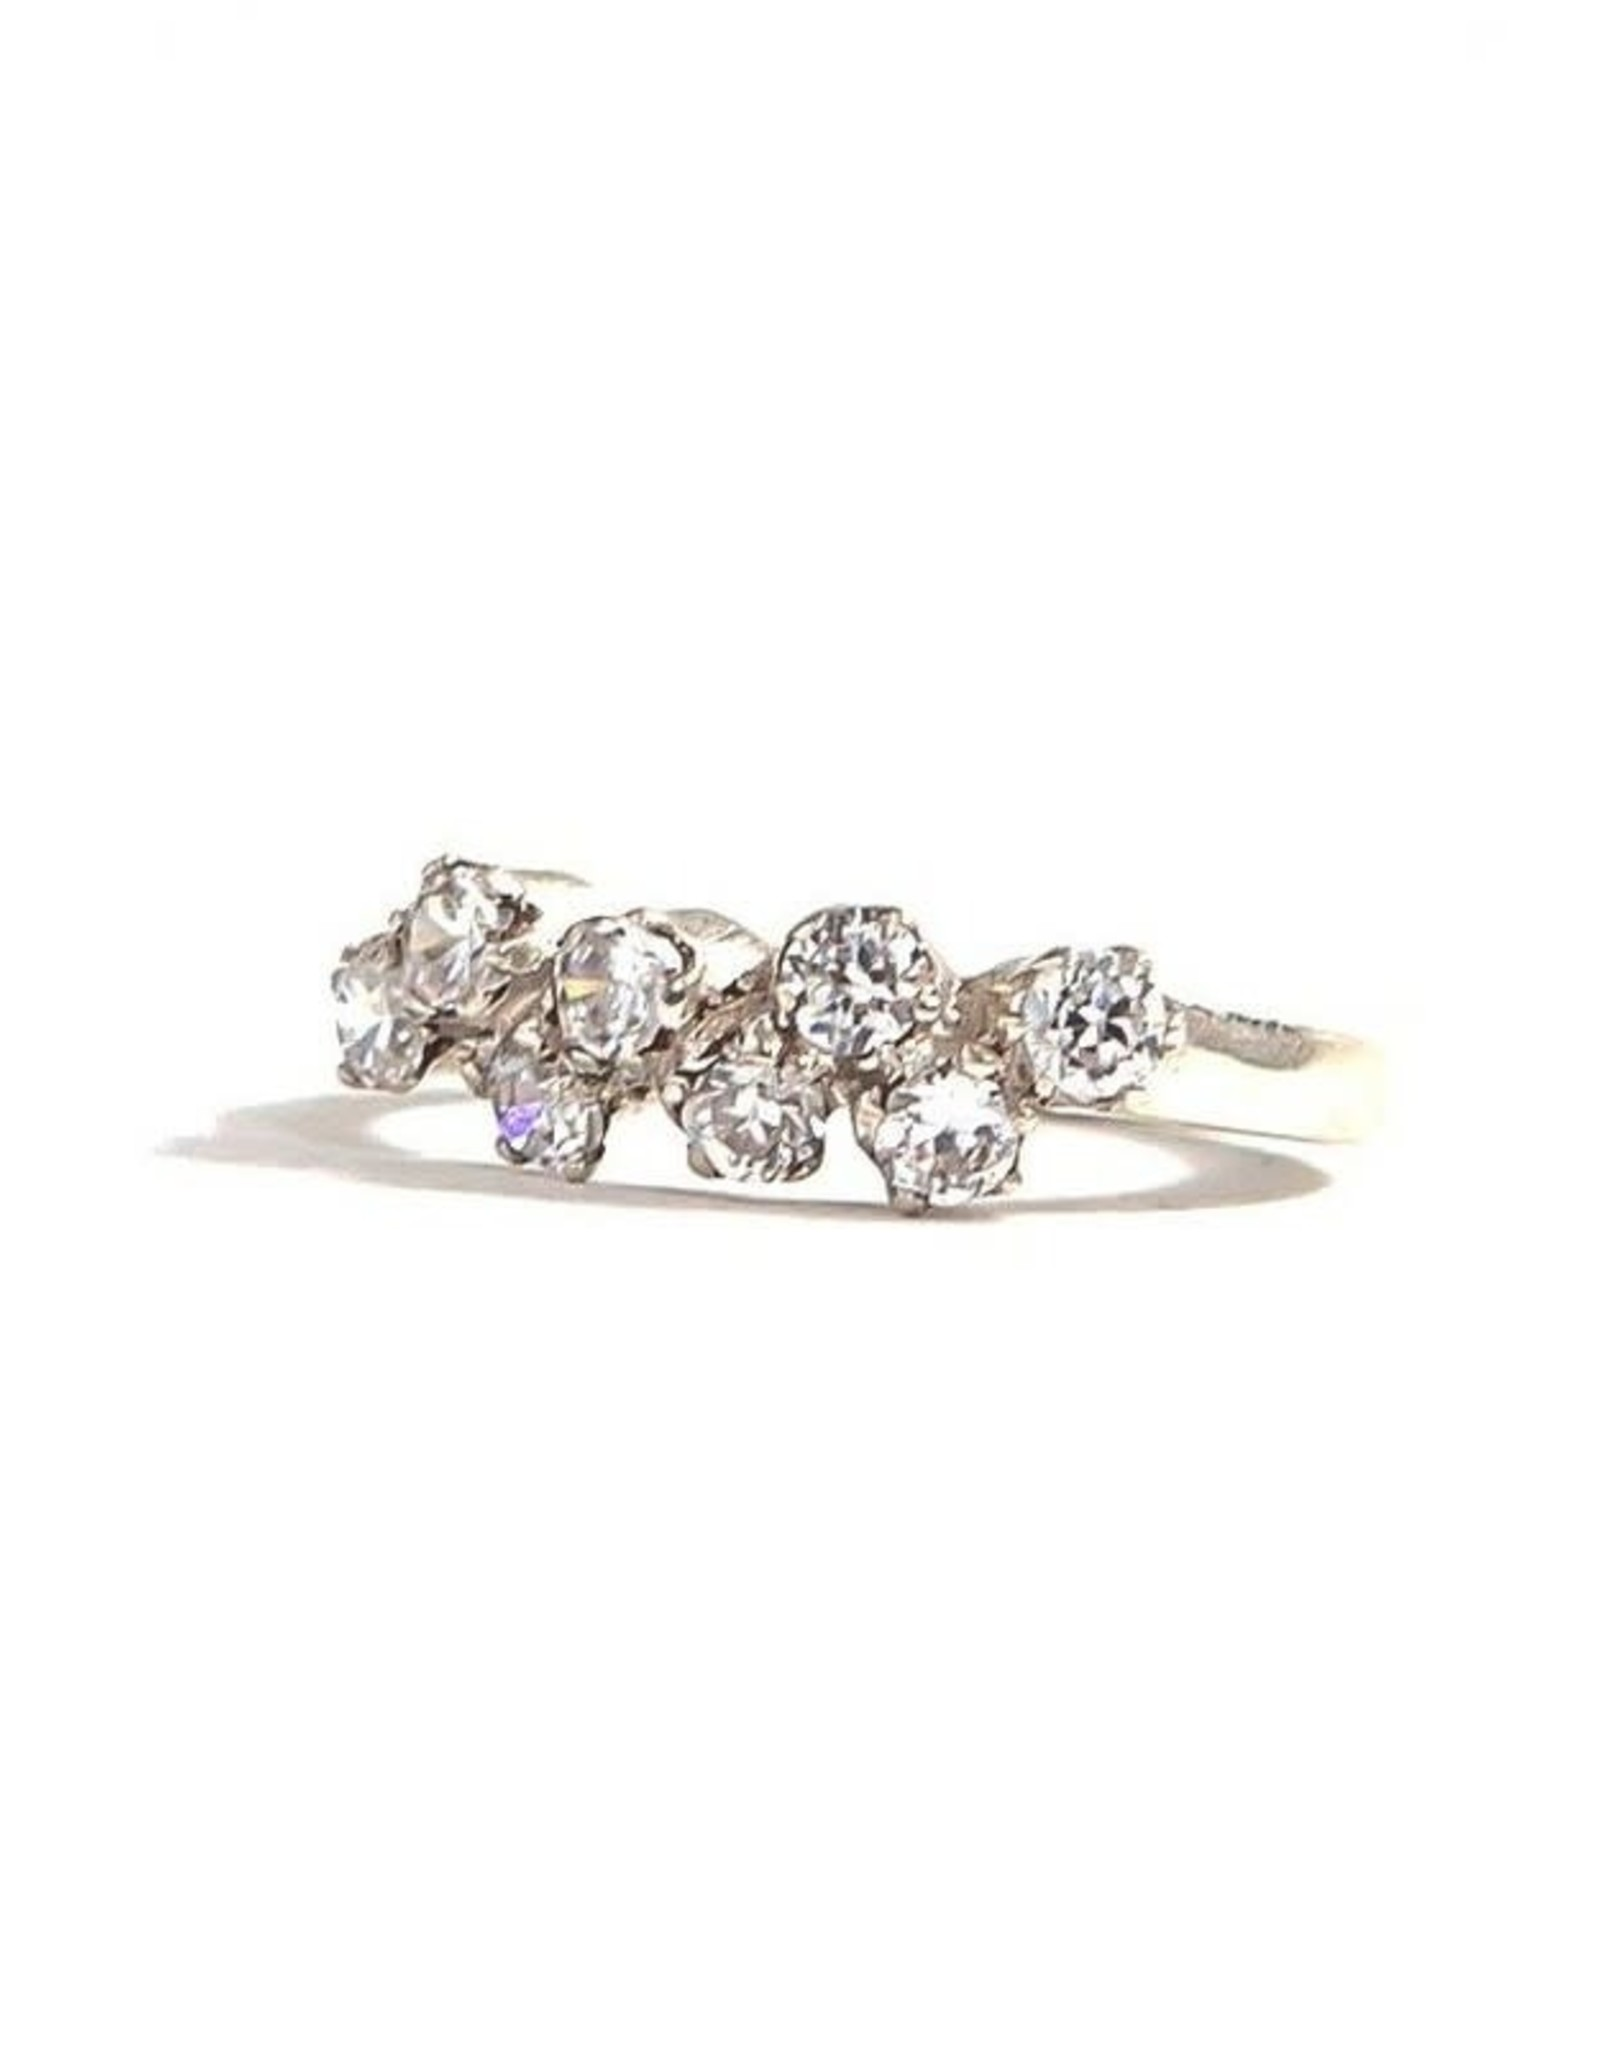 Fair Anita Galaxy Sterling Ring, India